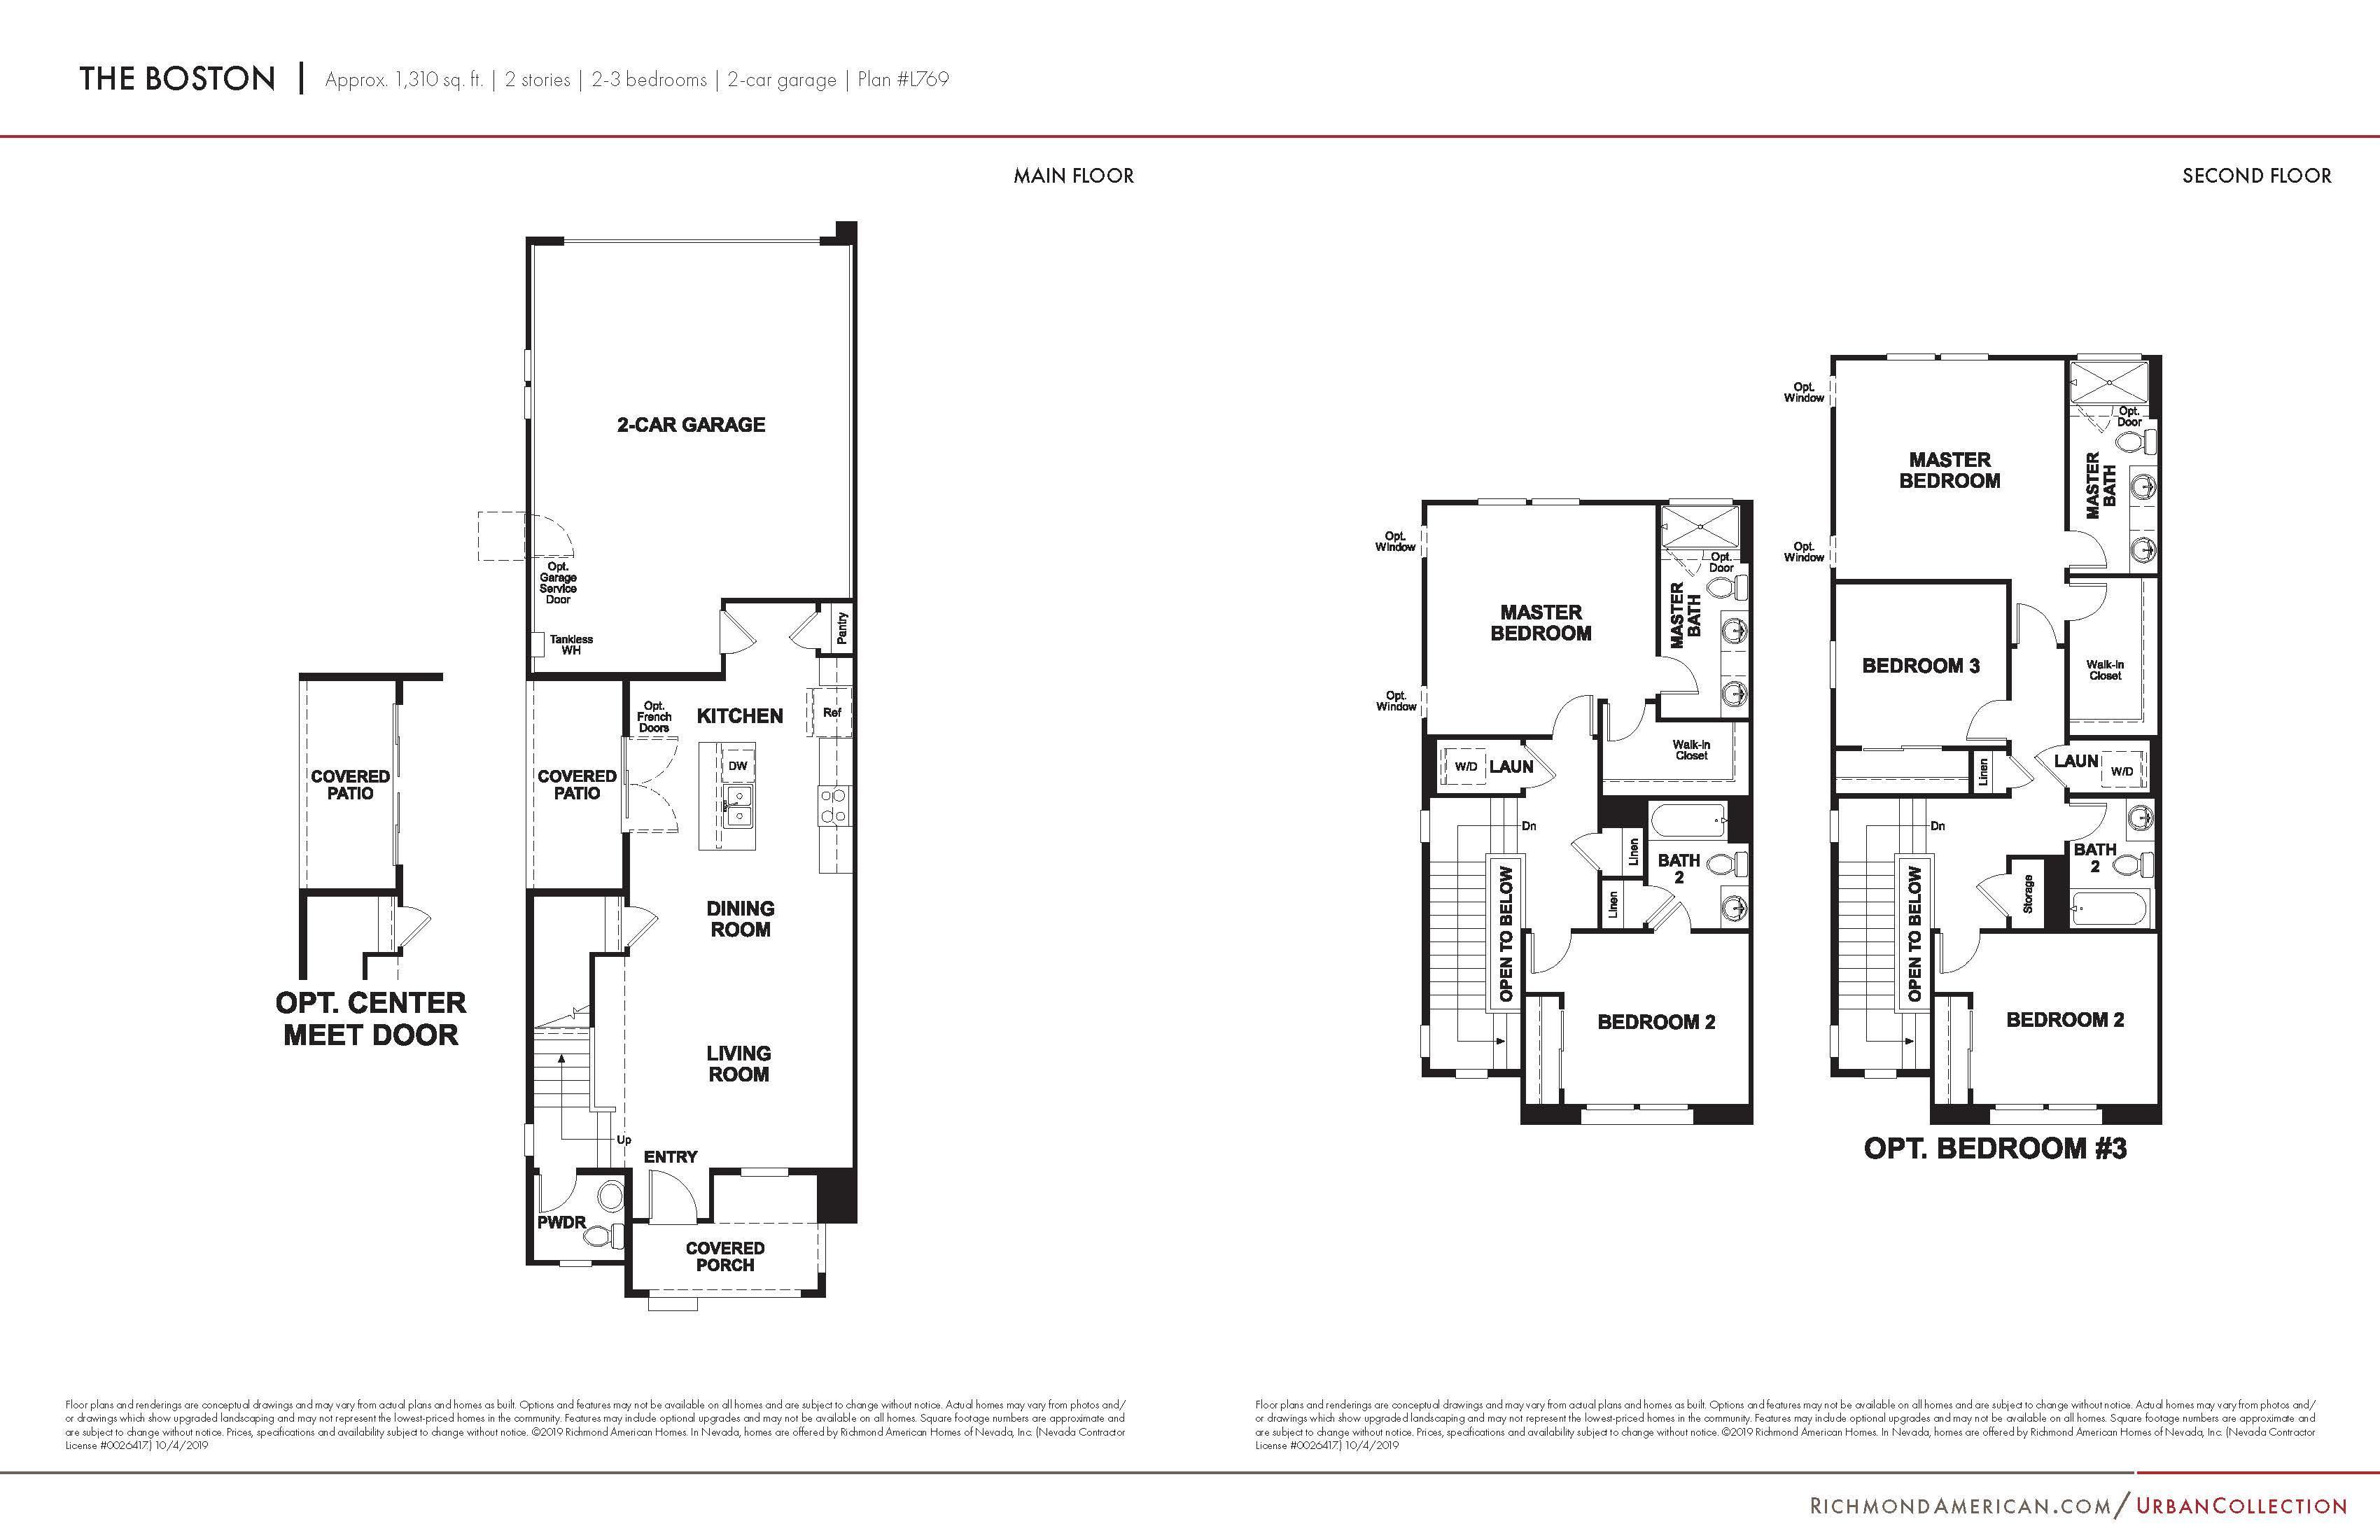 Floorplan for Boston